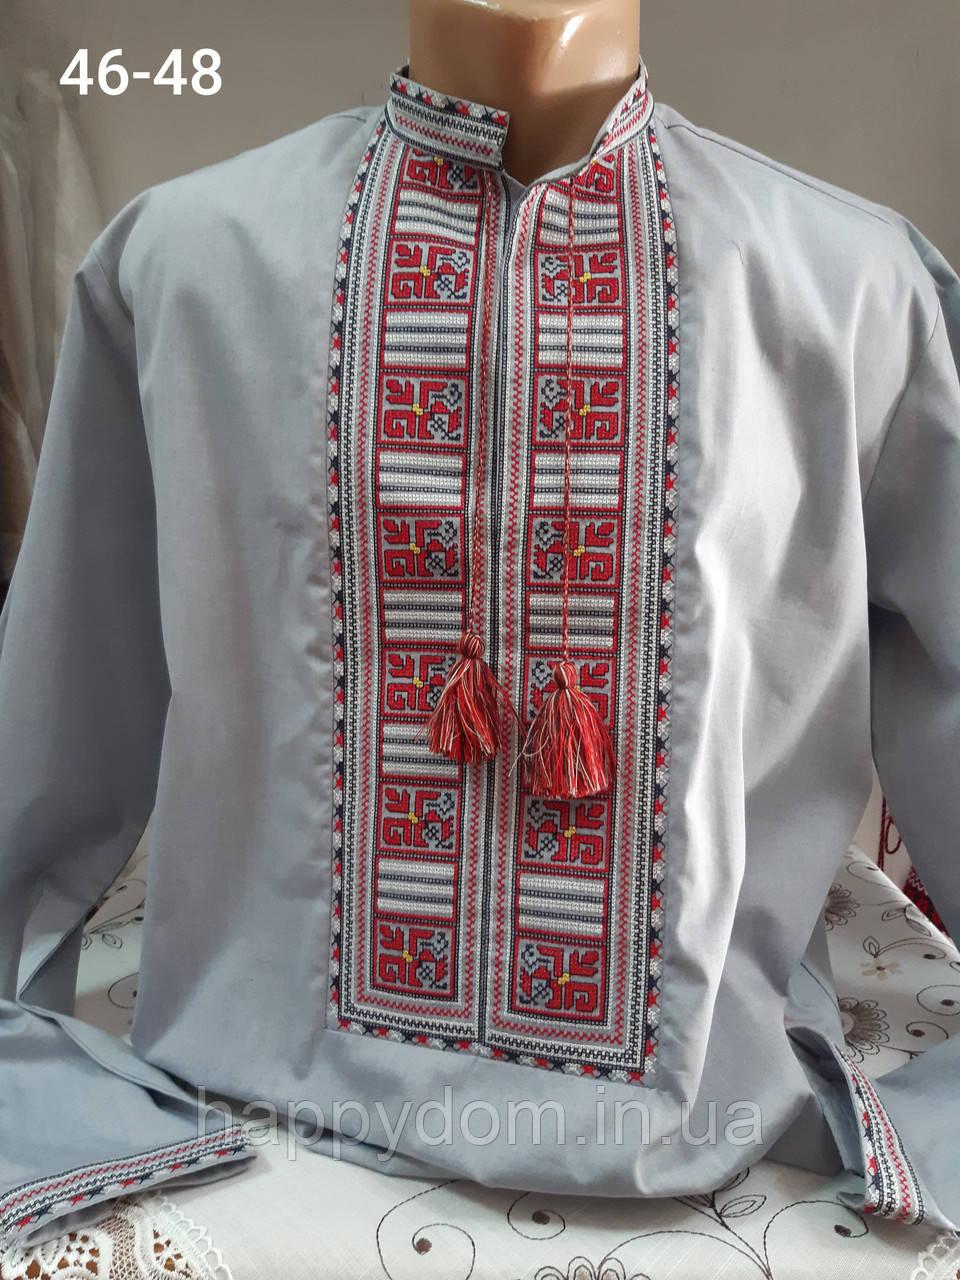 Рубашка вышиванка мужская серая